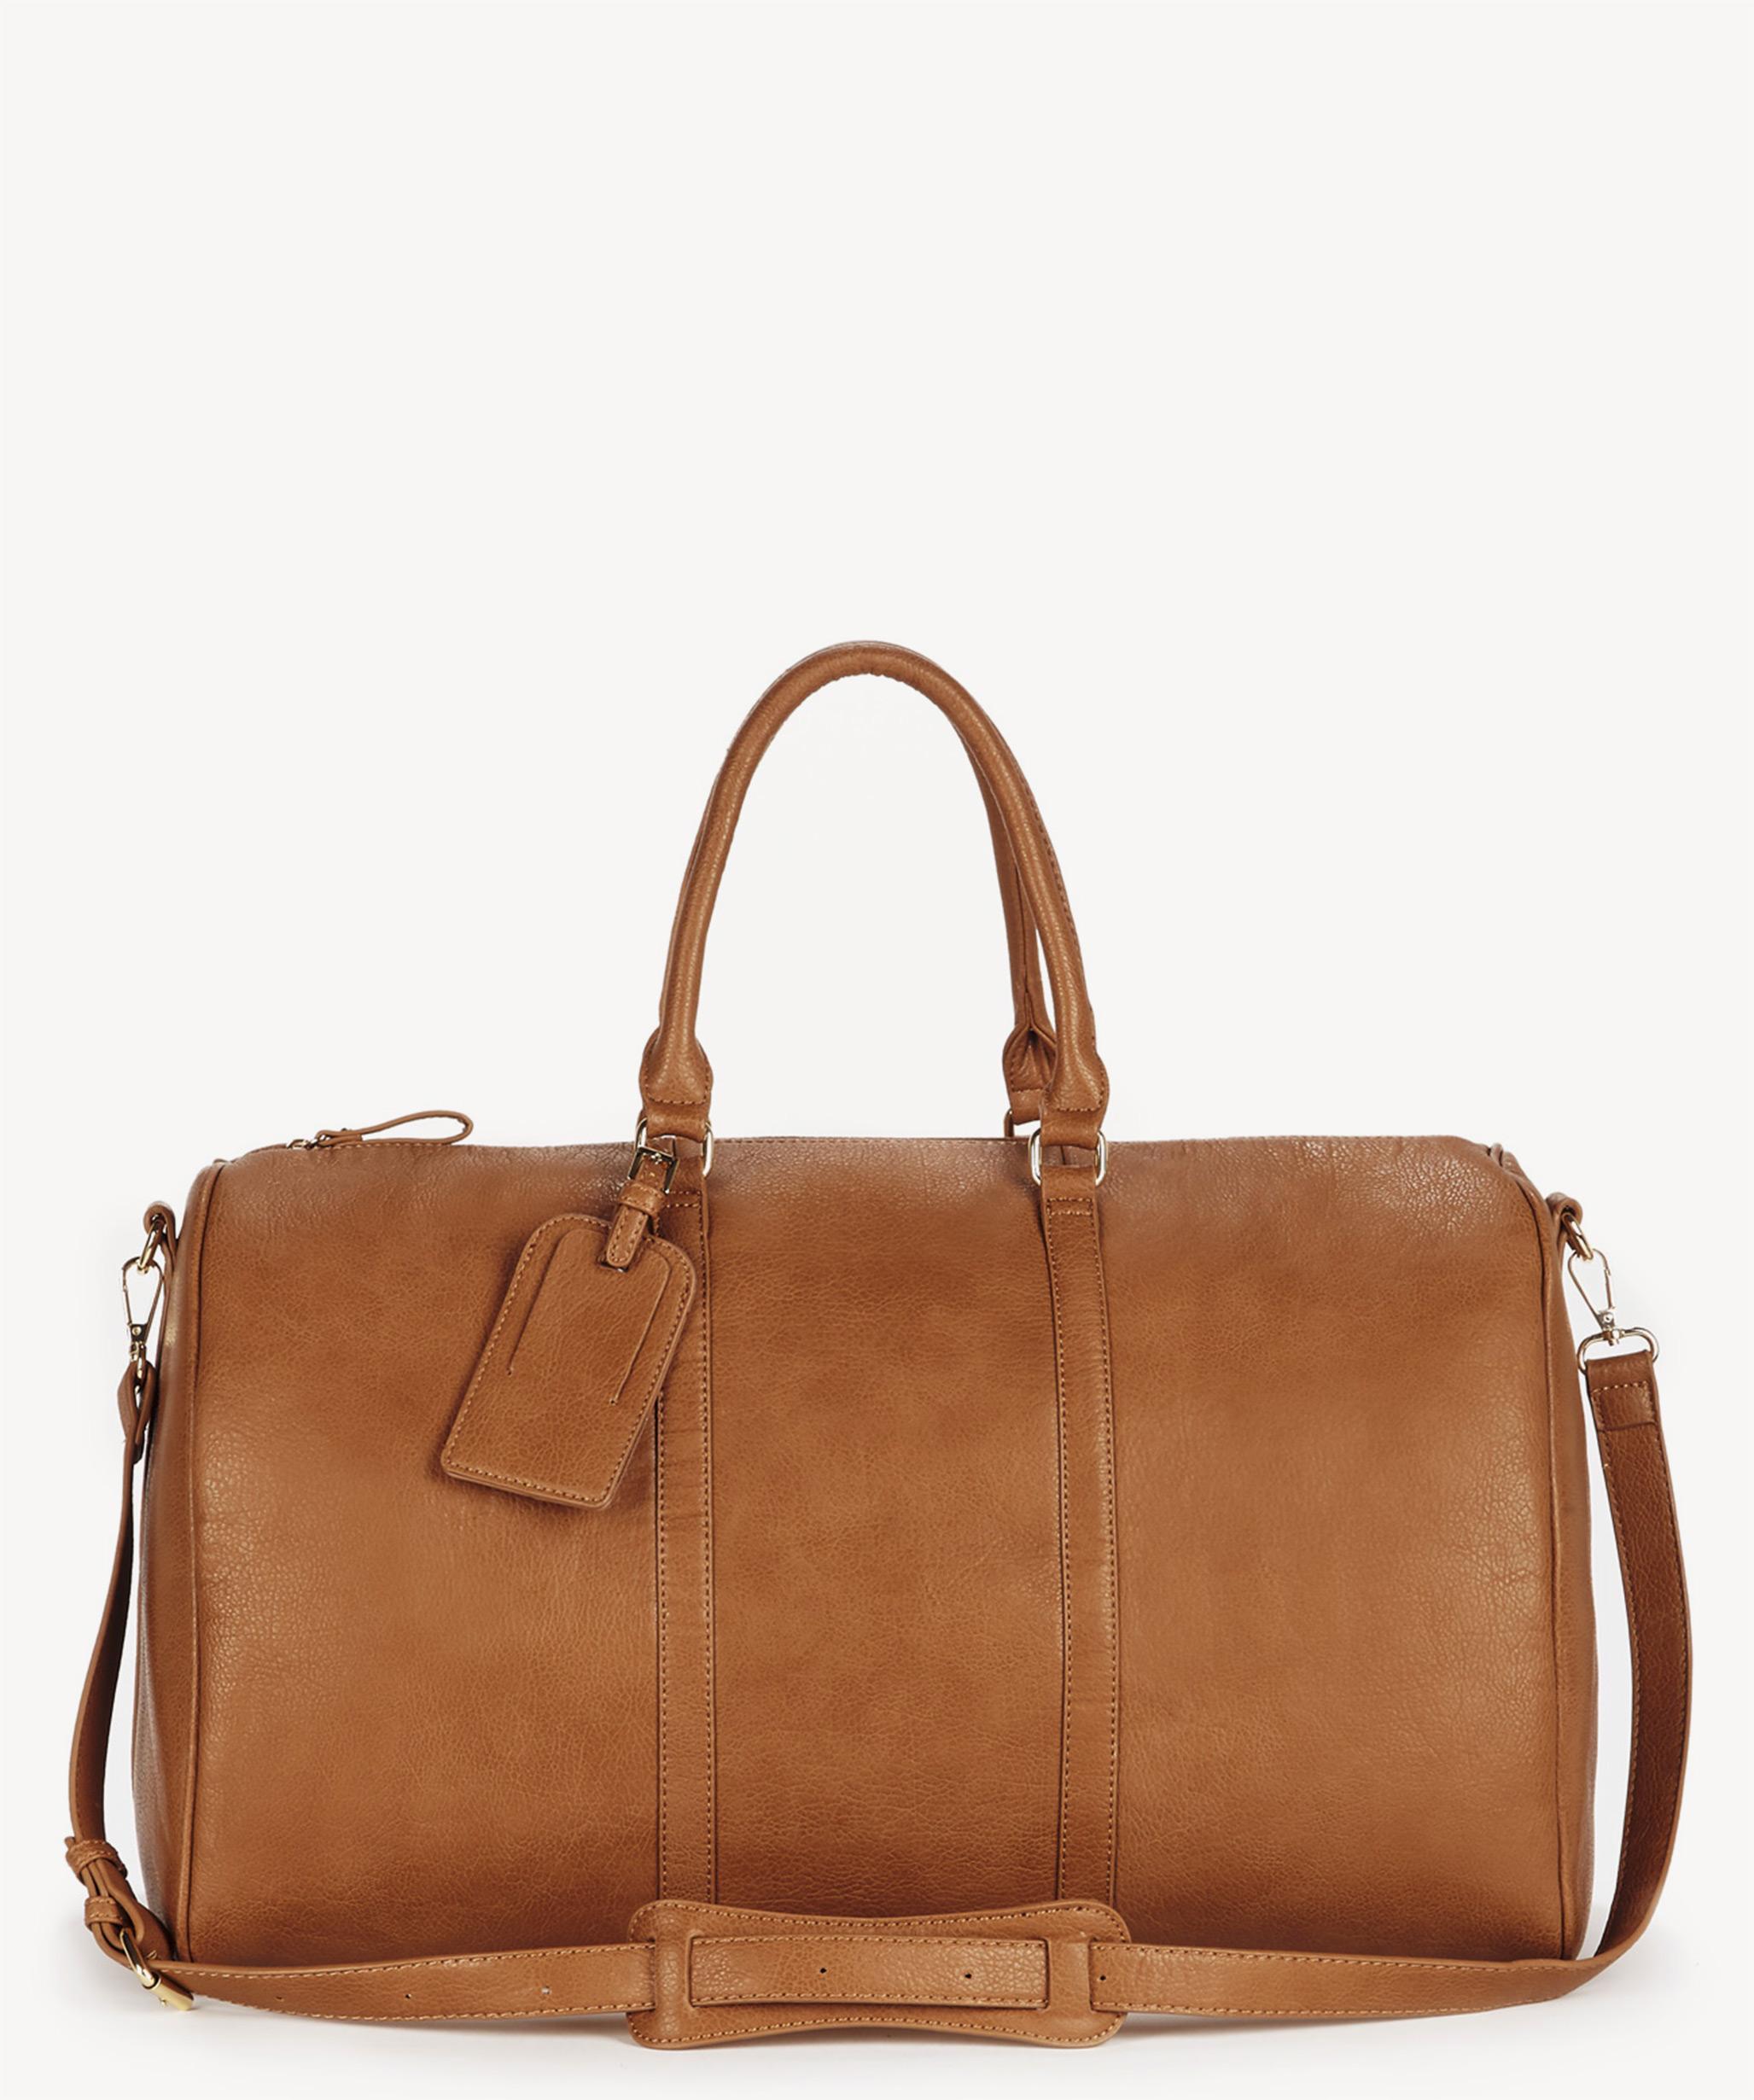 9047e81903 Women s Lacie Vegan Weekender In Color  Cognac One Size Bag